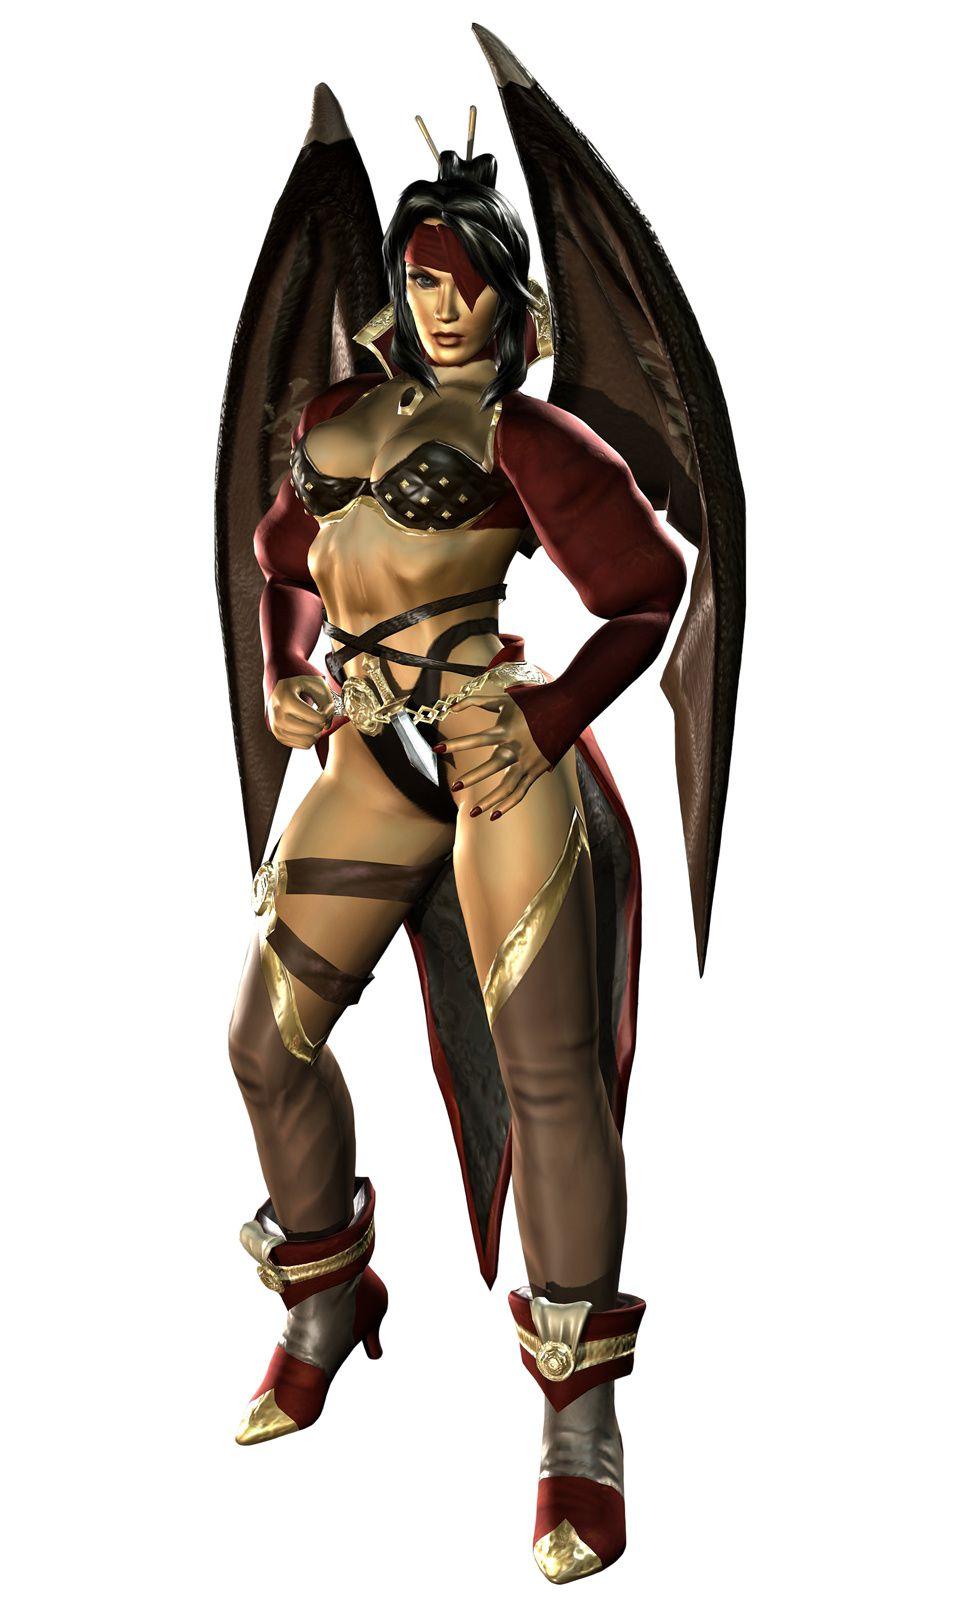 Nitara (Mortal Kombat)